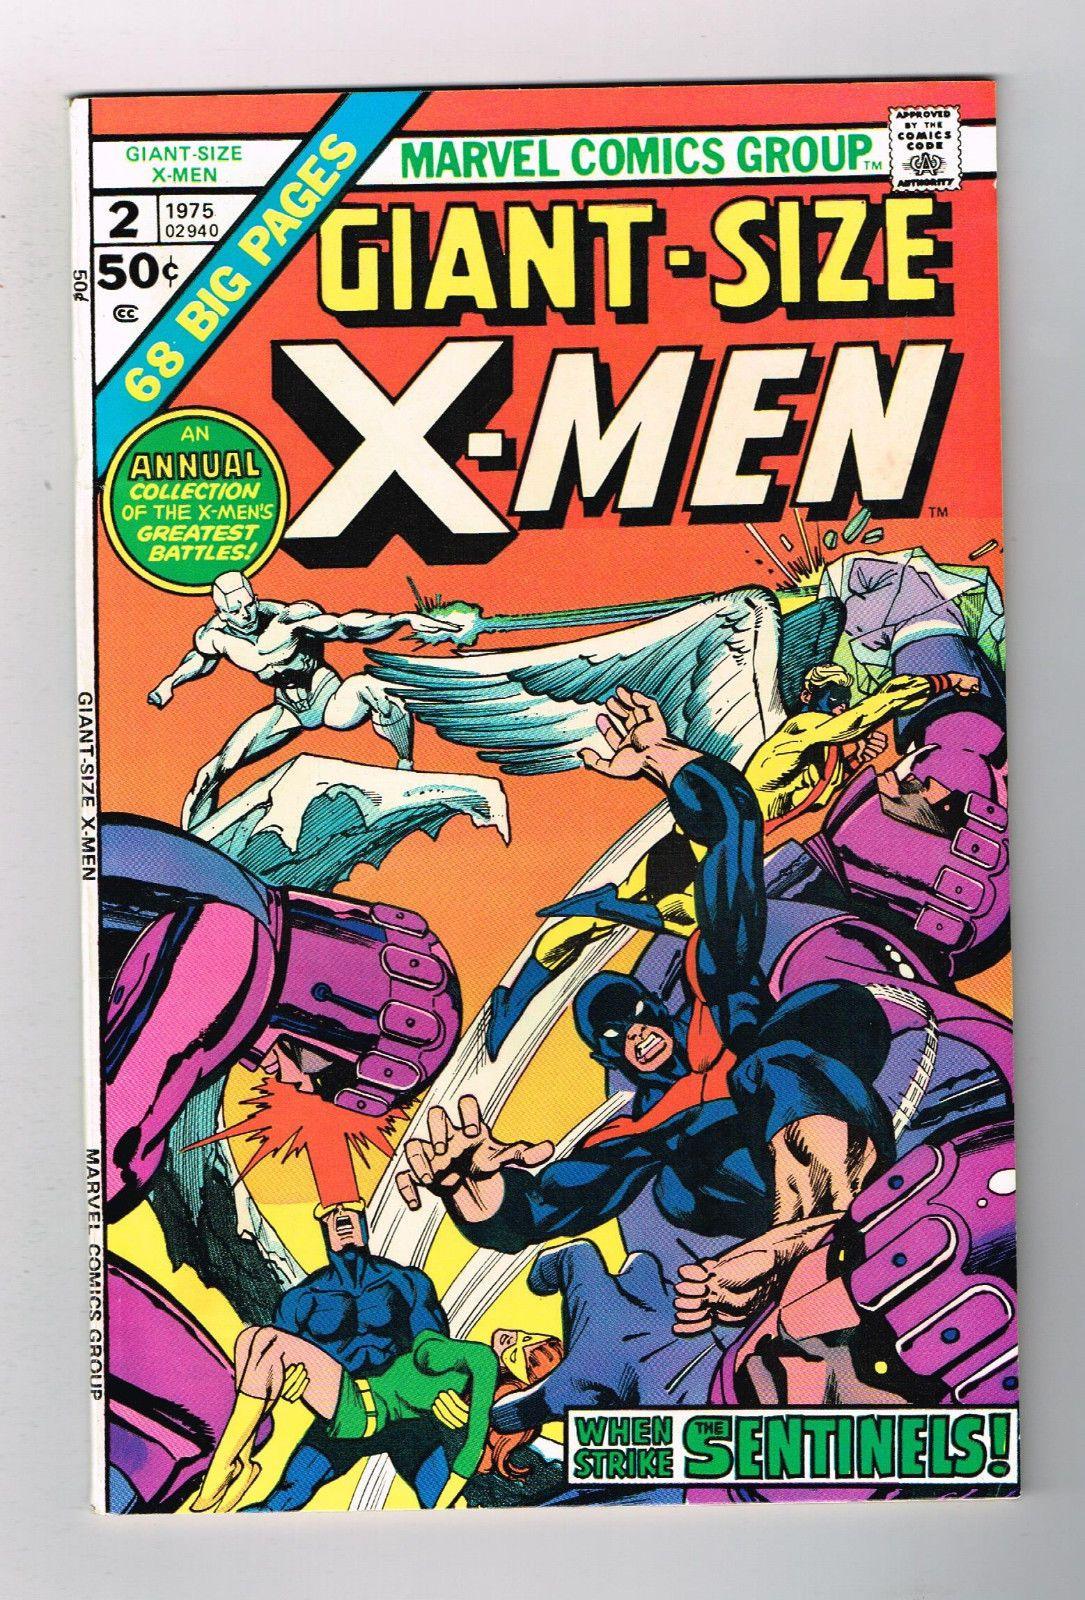 Giant Size X Men 2 Bronze Age Grade 70 With Beautiful Gil Kane Cover 291551018830 Jpg 1085 1600 Portada De Historieta Marvel Comics Comics